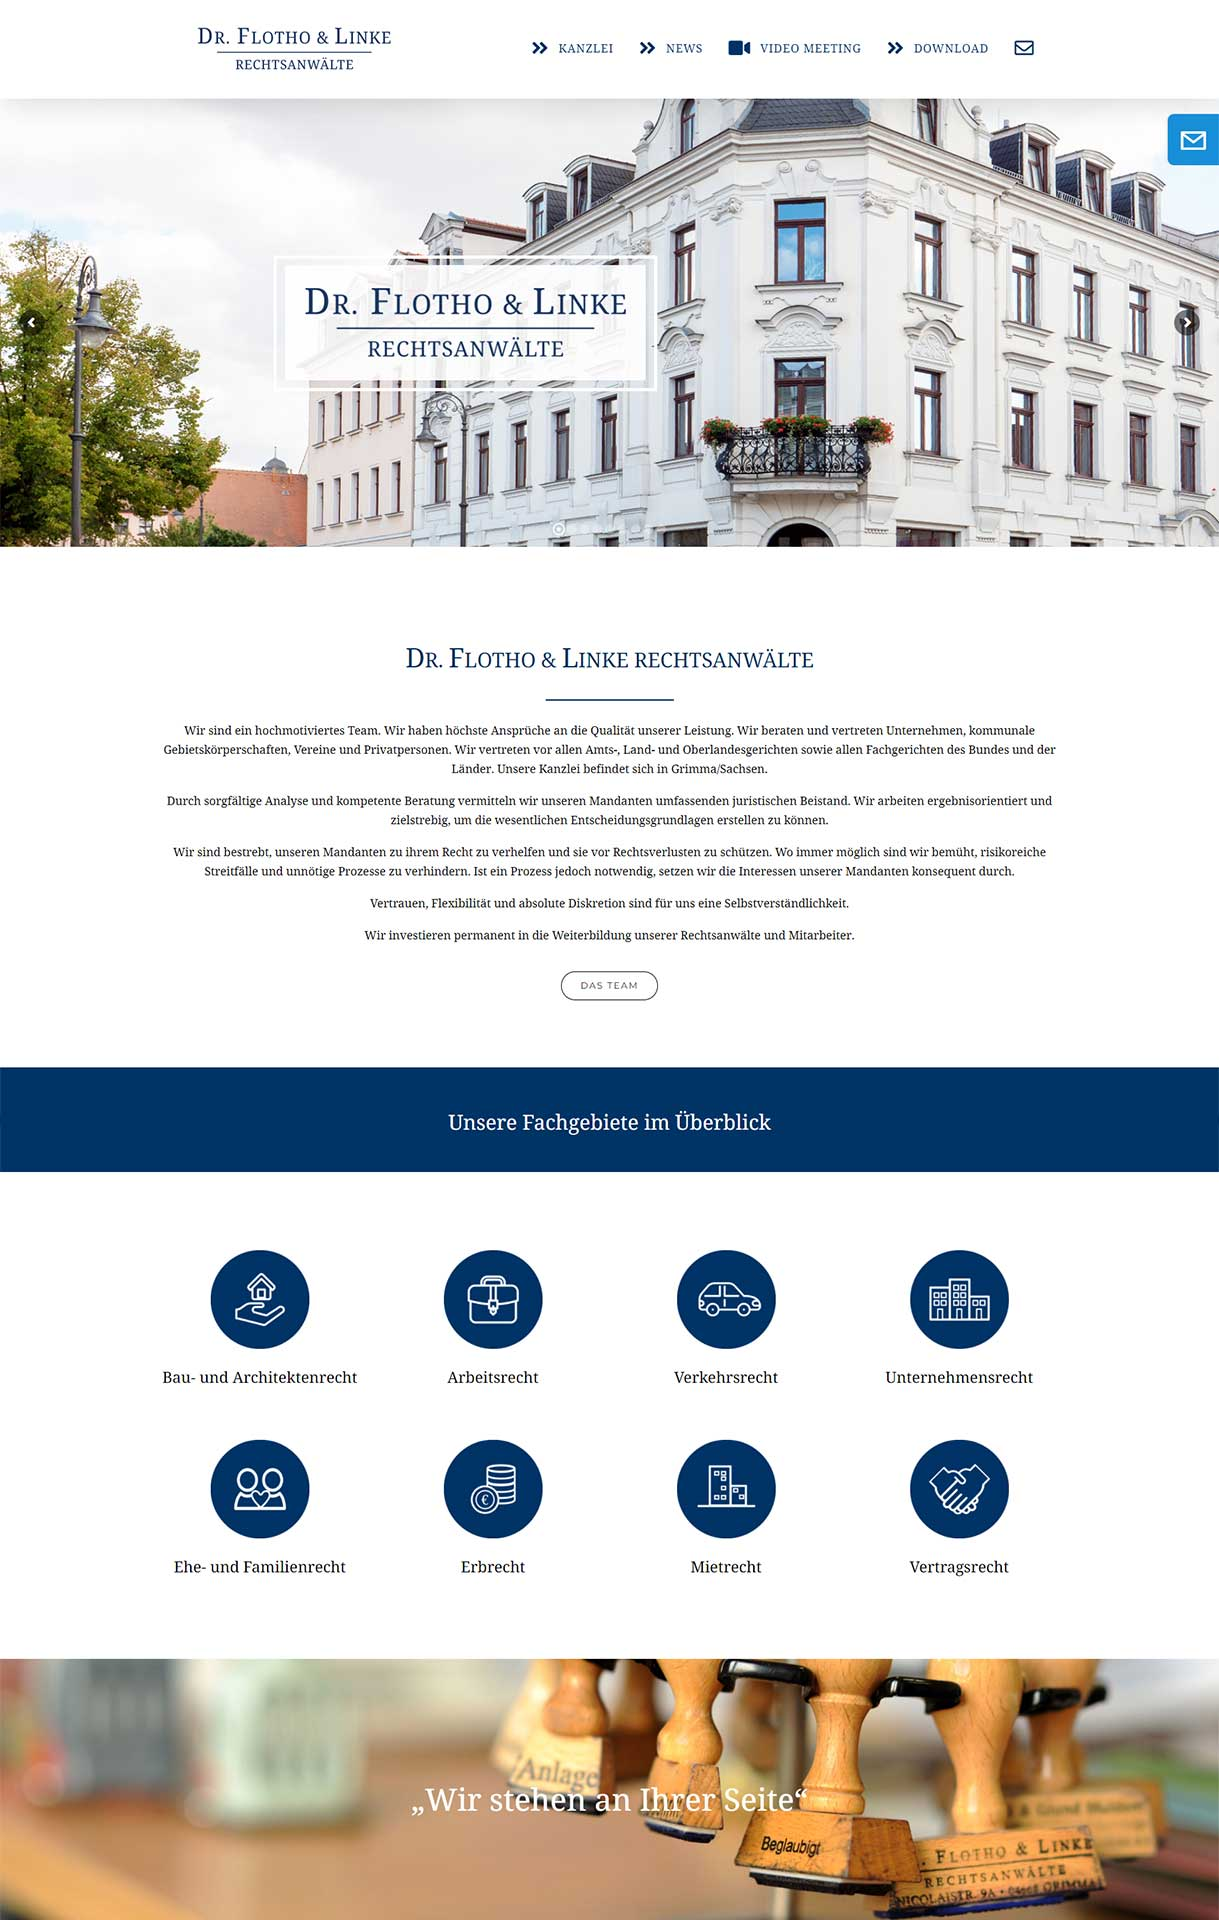 webdesign-flashlightmedia-werbeagentur-leipzig-grimma-startseite-ra-flotho-linke-webseite